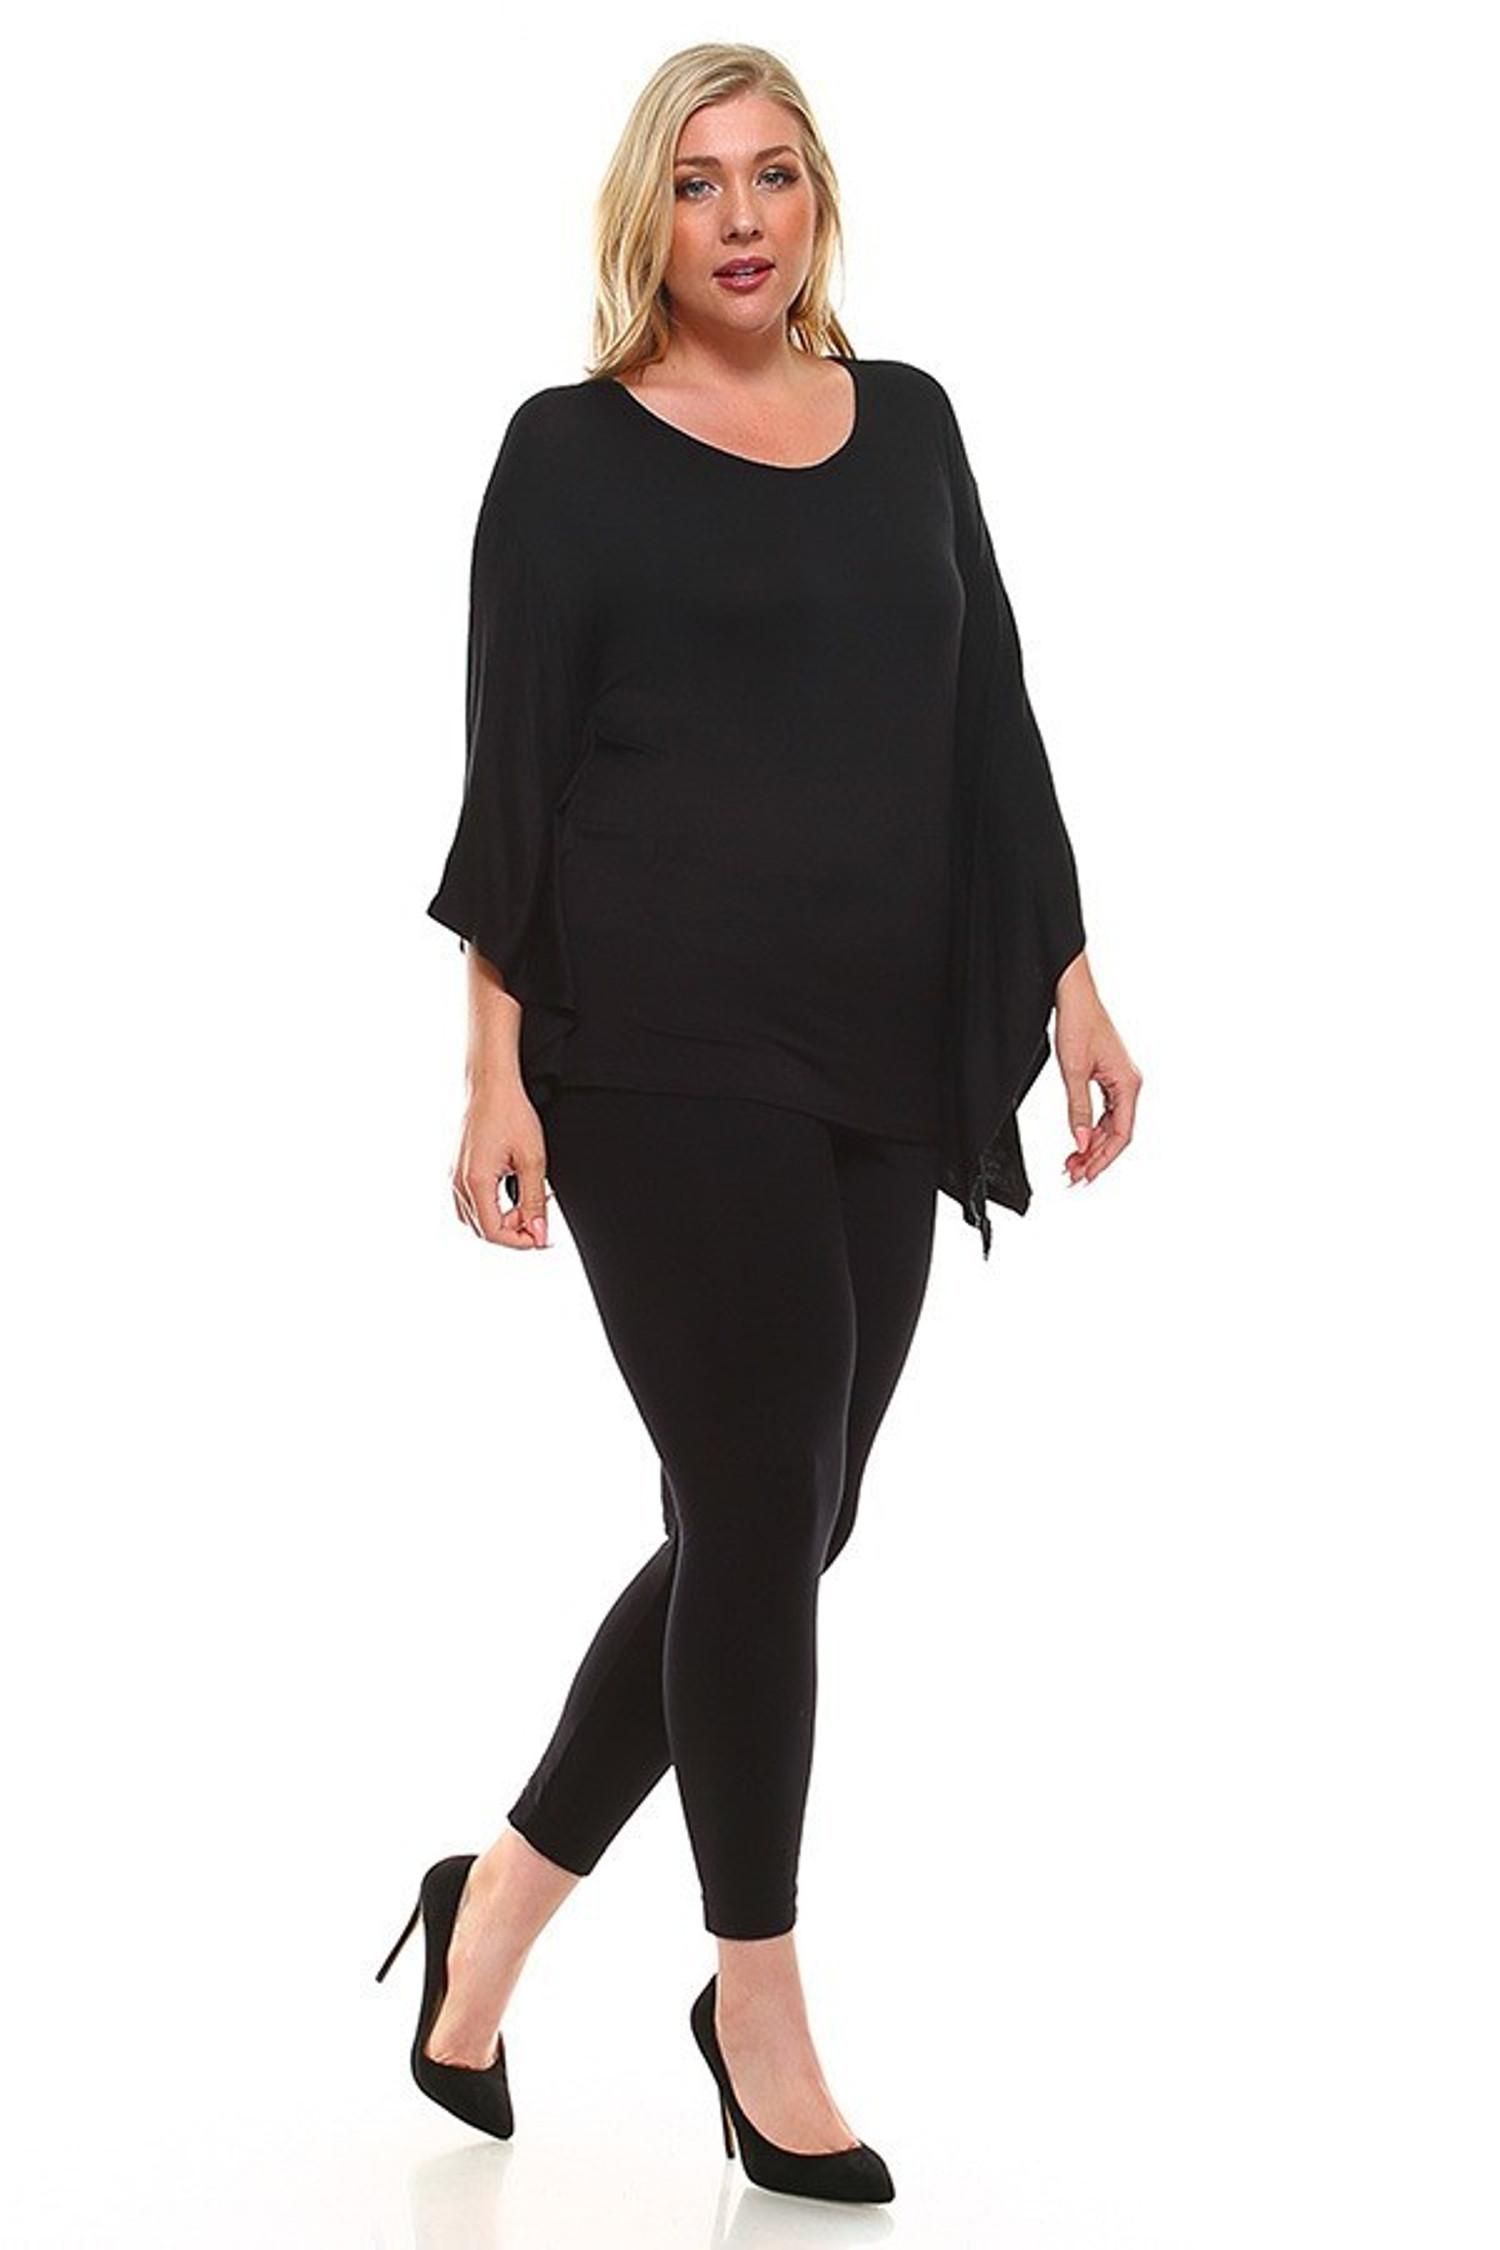 Round Neck Cape Style Sleeveless Rayon Plus Size Top